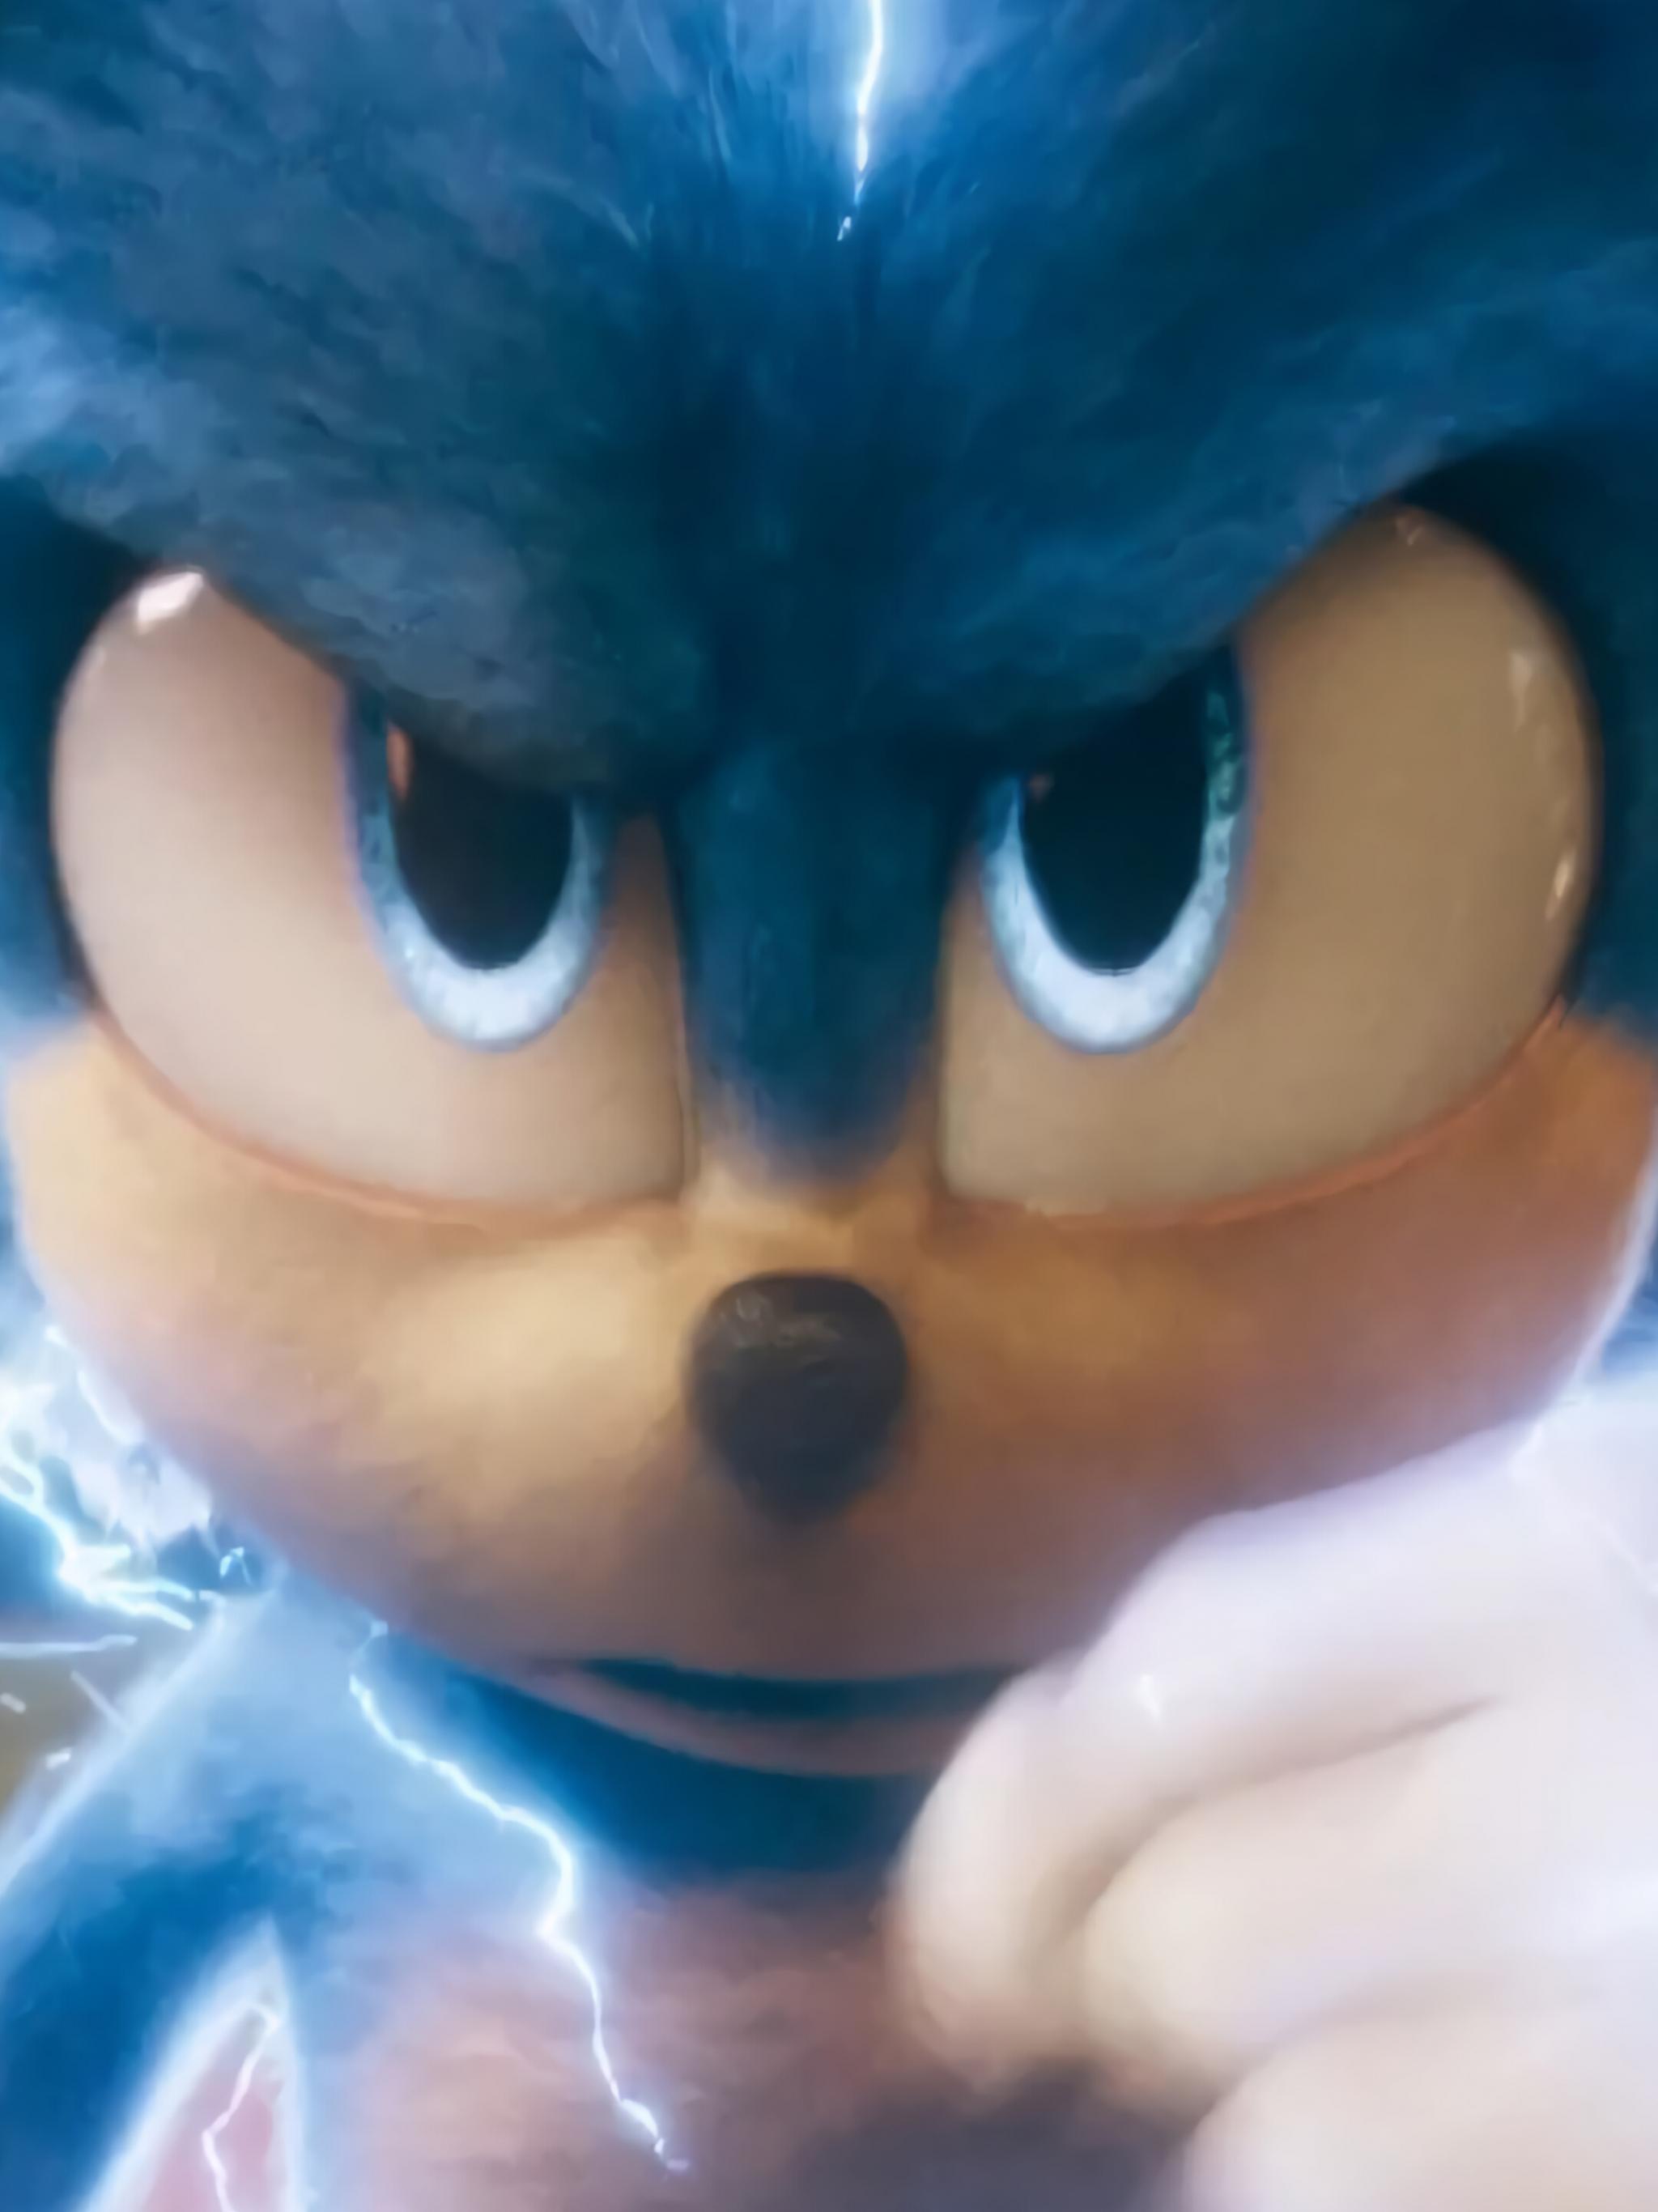 Free Download Sonic The Hedgehog Running New Movie 2020 4k Wallpaper 7267 2160x3840 For Your Desktop Mobile Tablet Explore 28 Sonic The Hedgehog Movie 2020 Wallpapers Sonic The Hedgehog